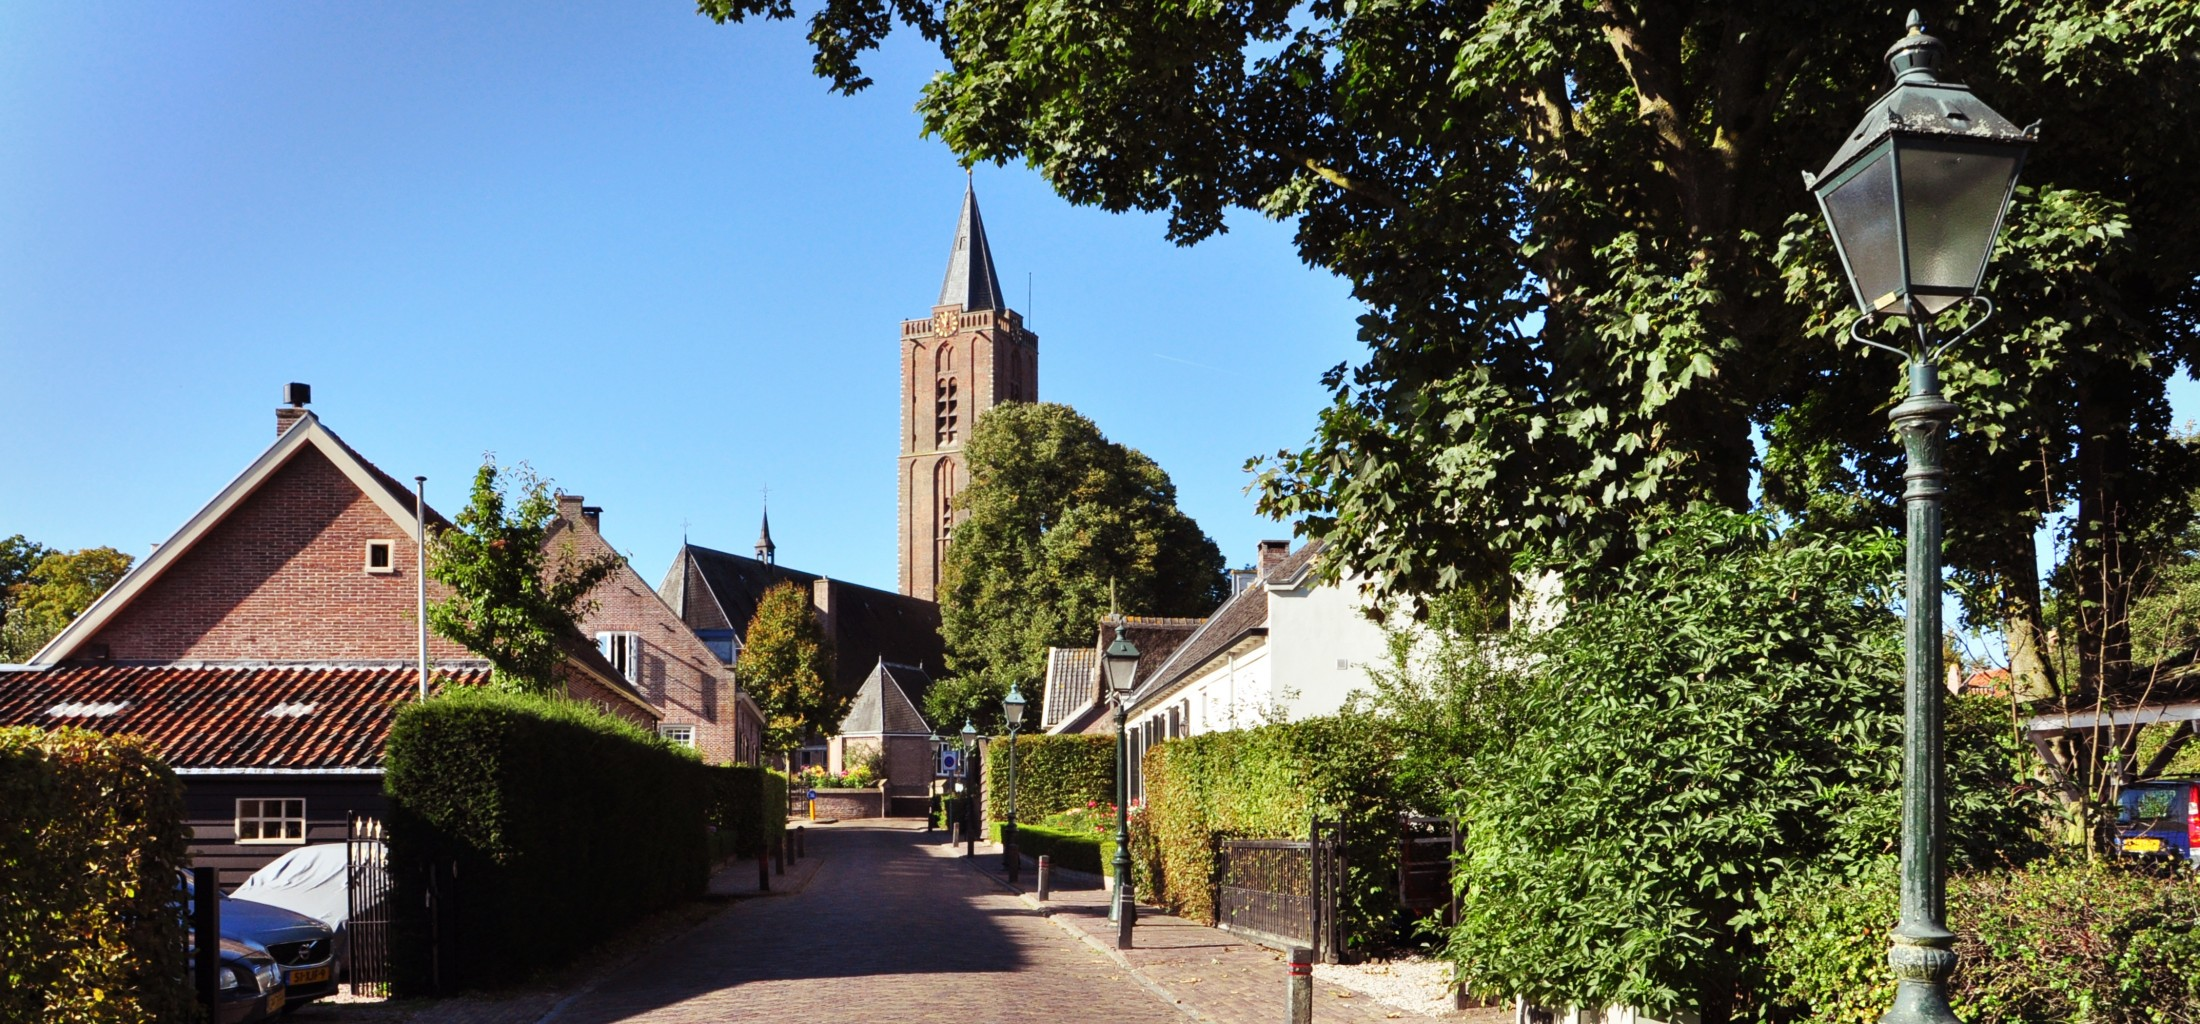 Straat en kerktoren in Soest